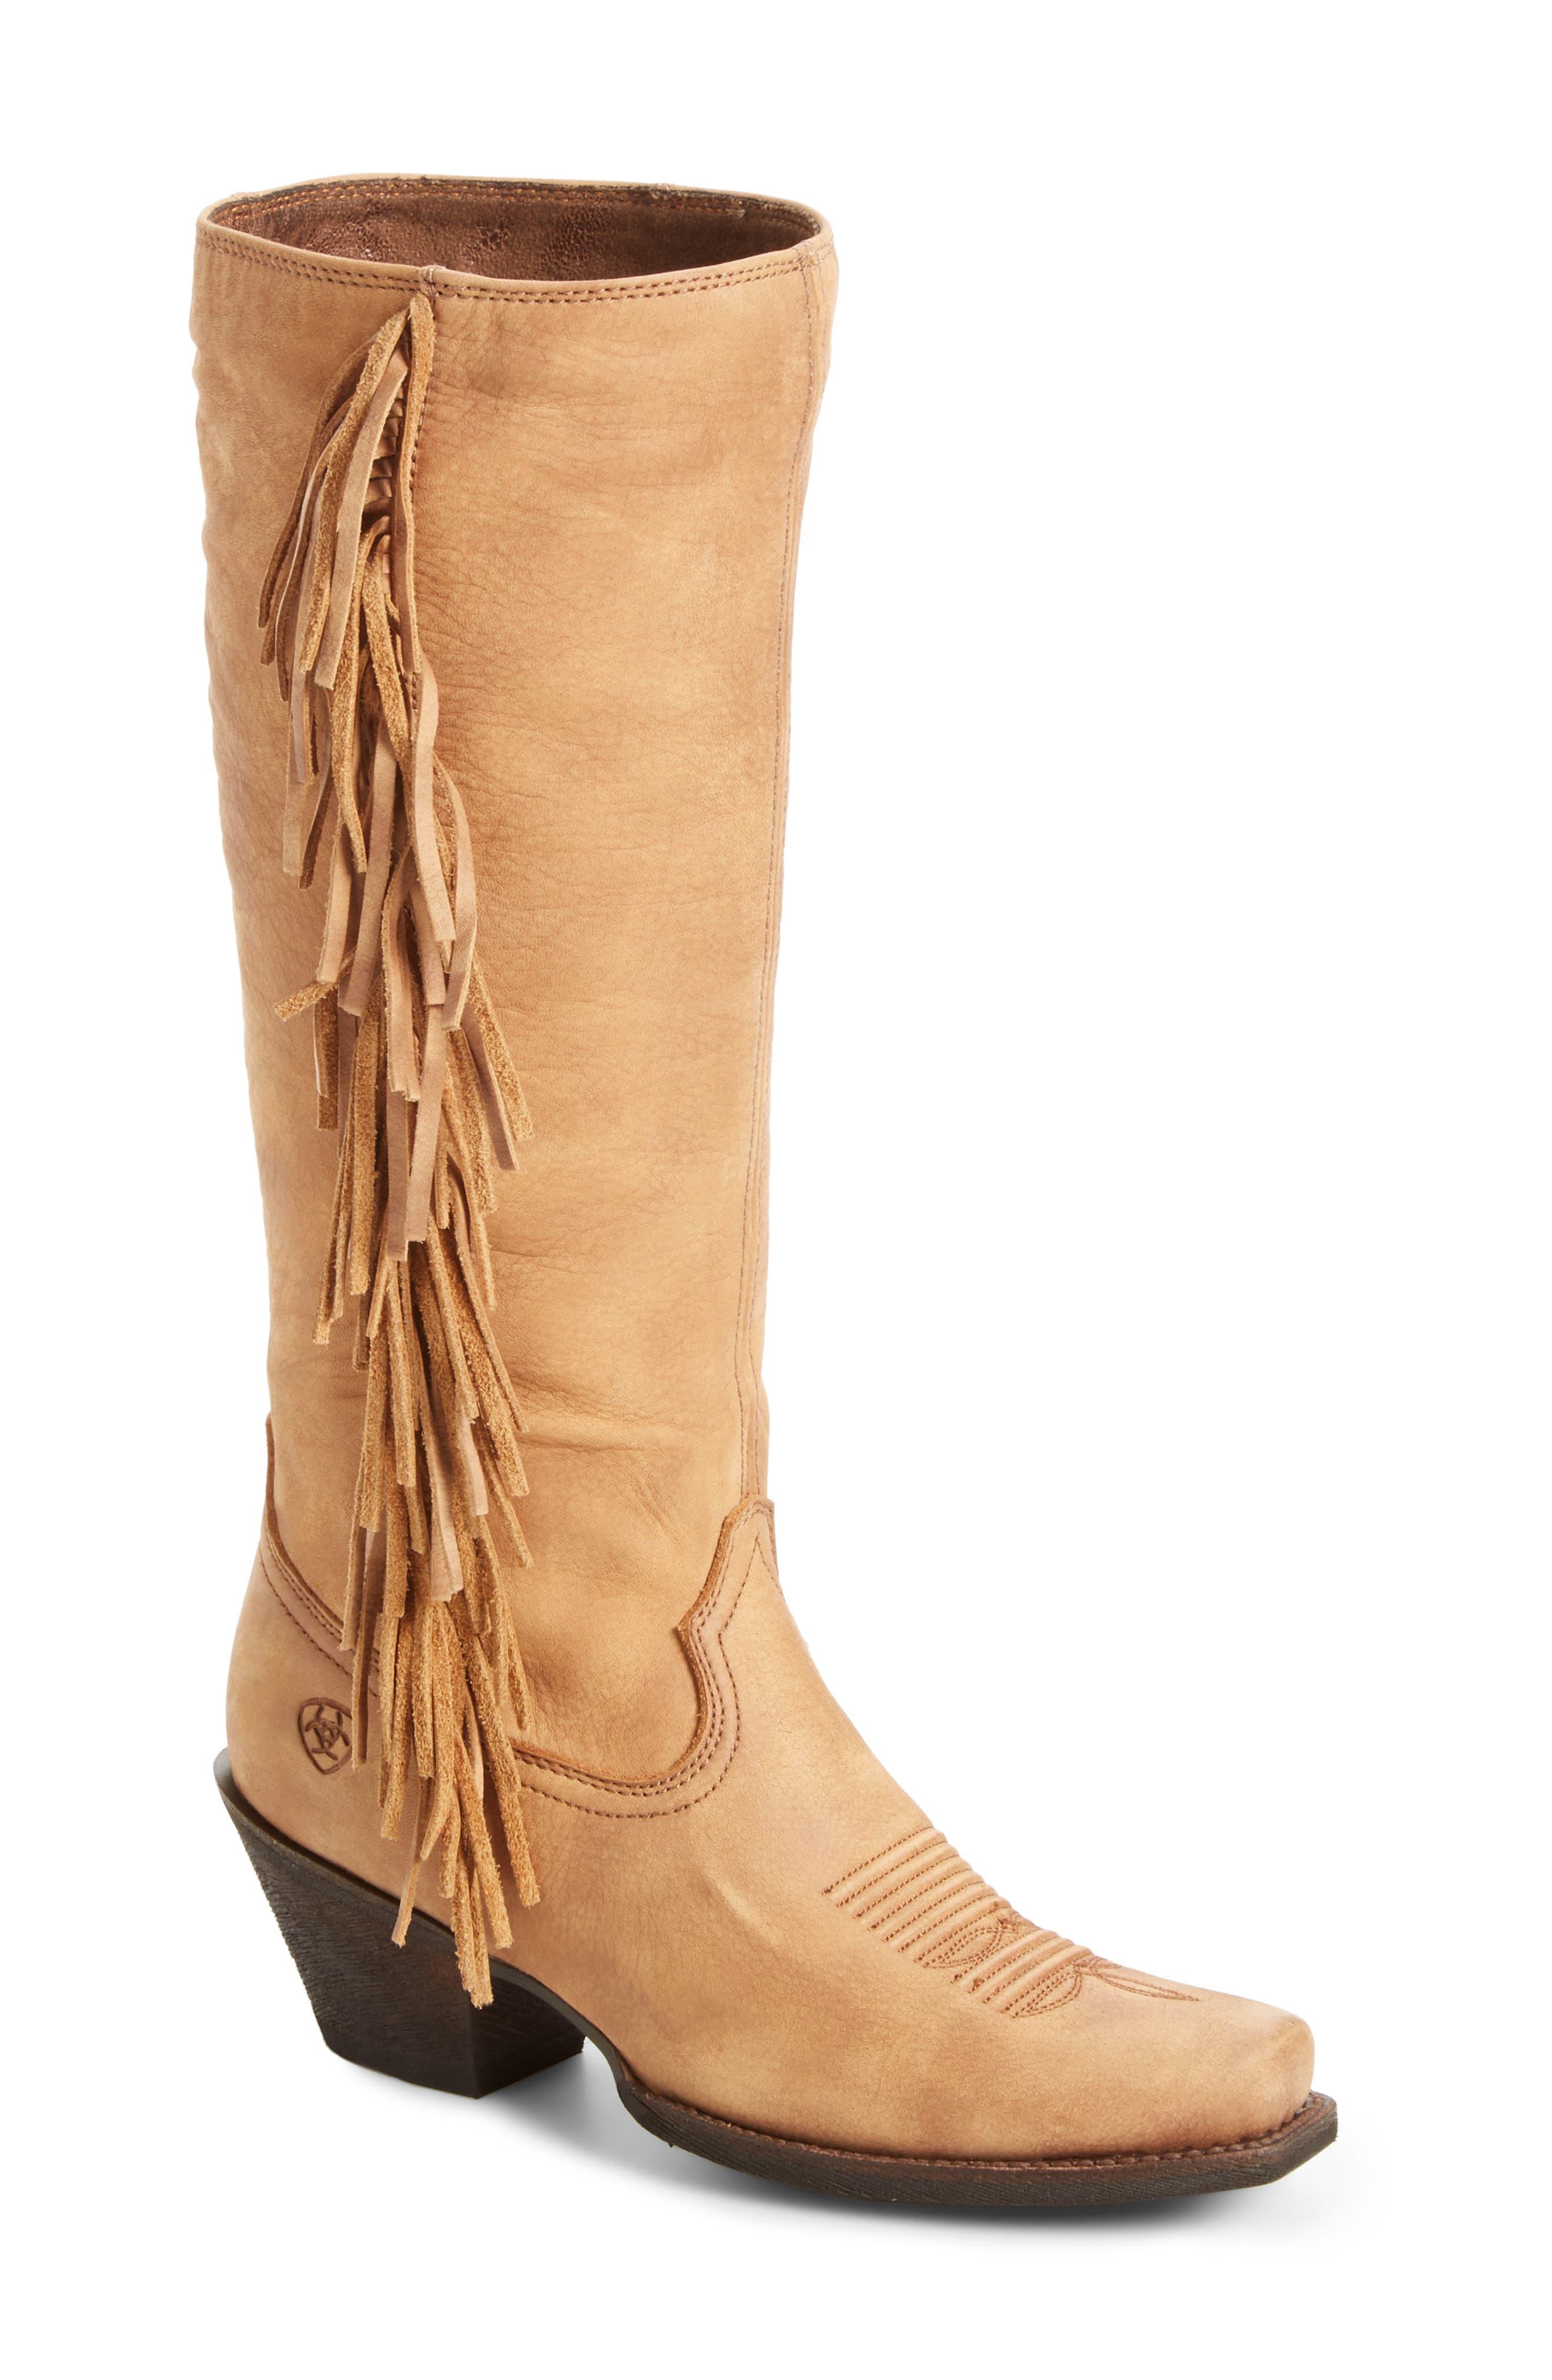 Leyton Fringe Western Boot,                         Main,                         color, Tack Room Honey Leather